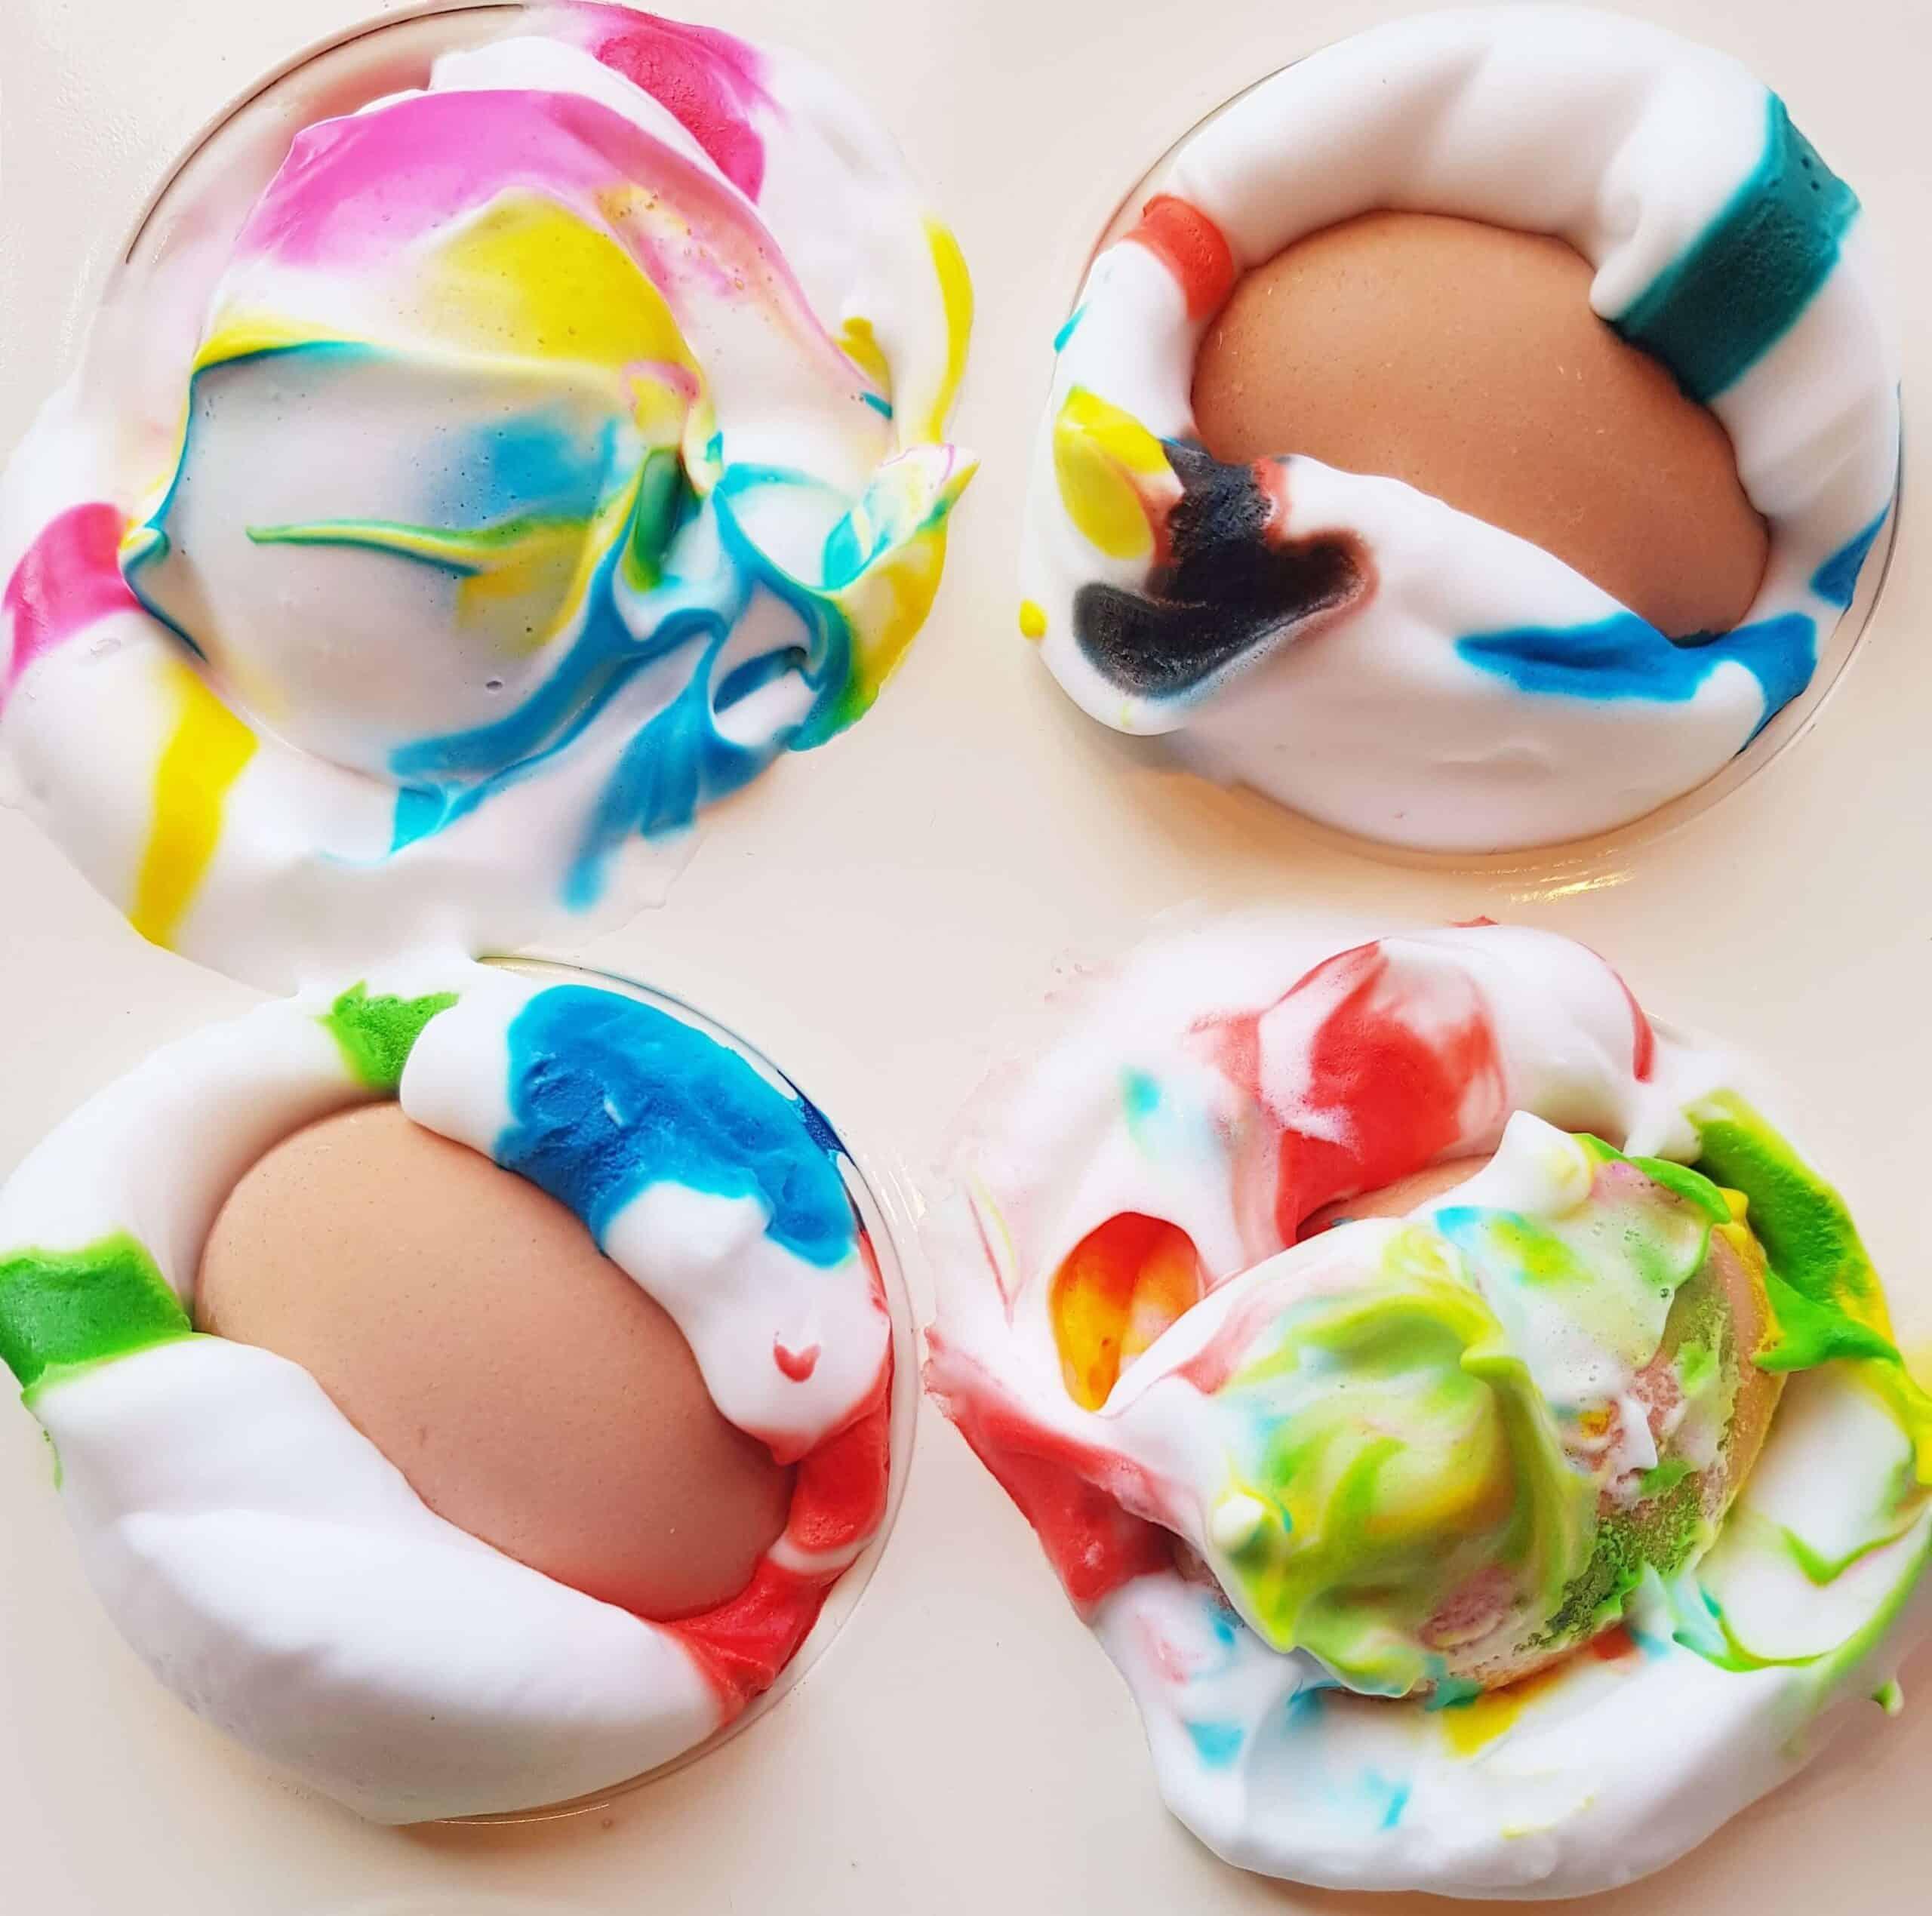 turn eggs in shaving cream